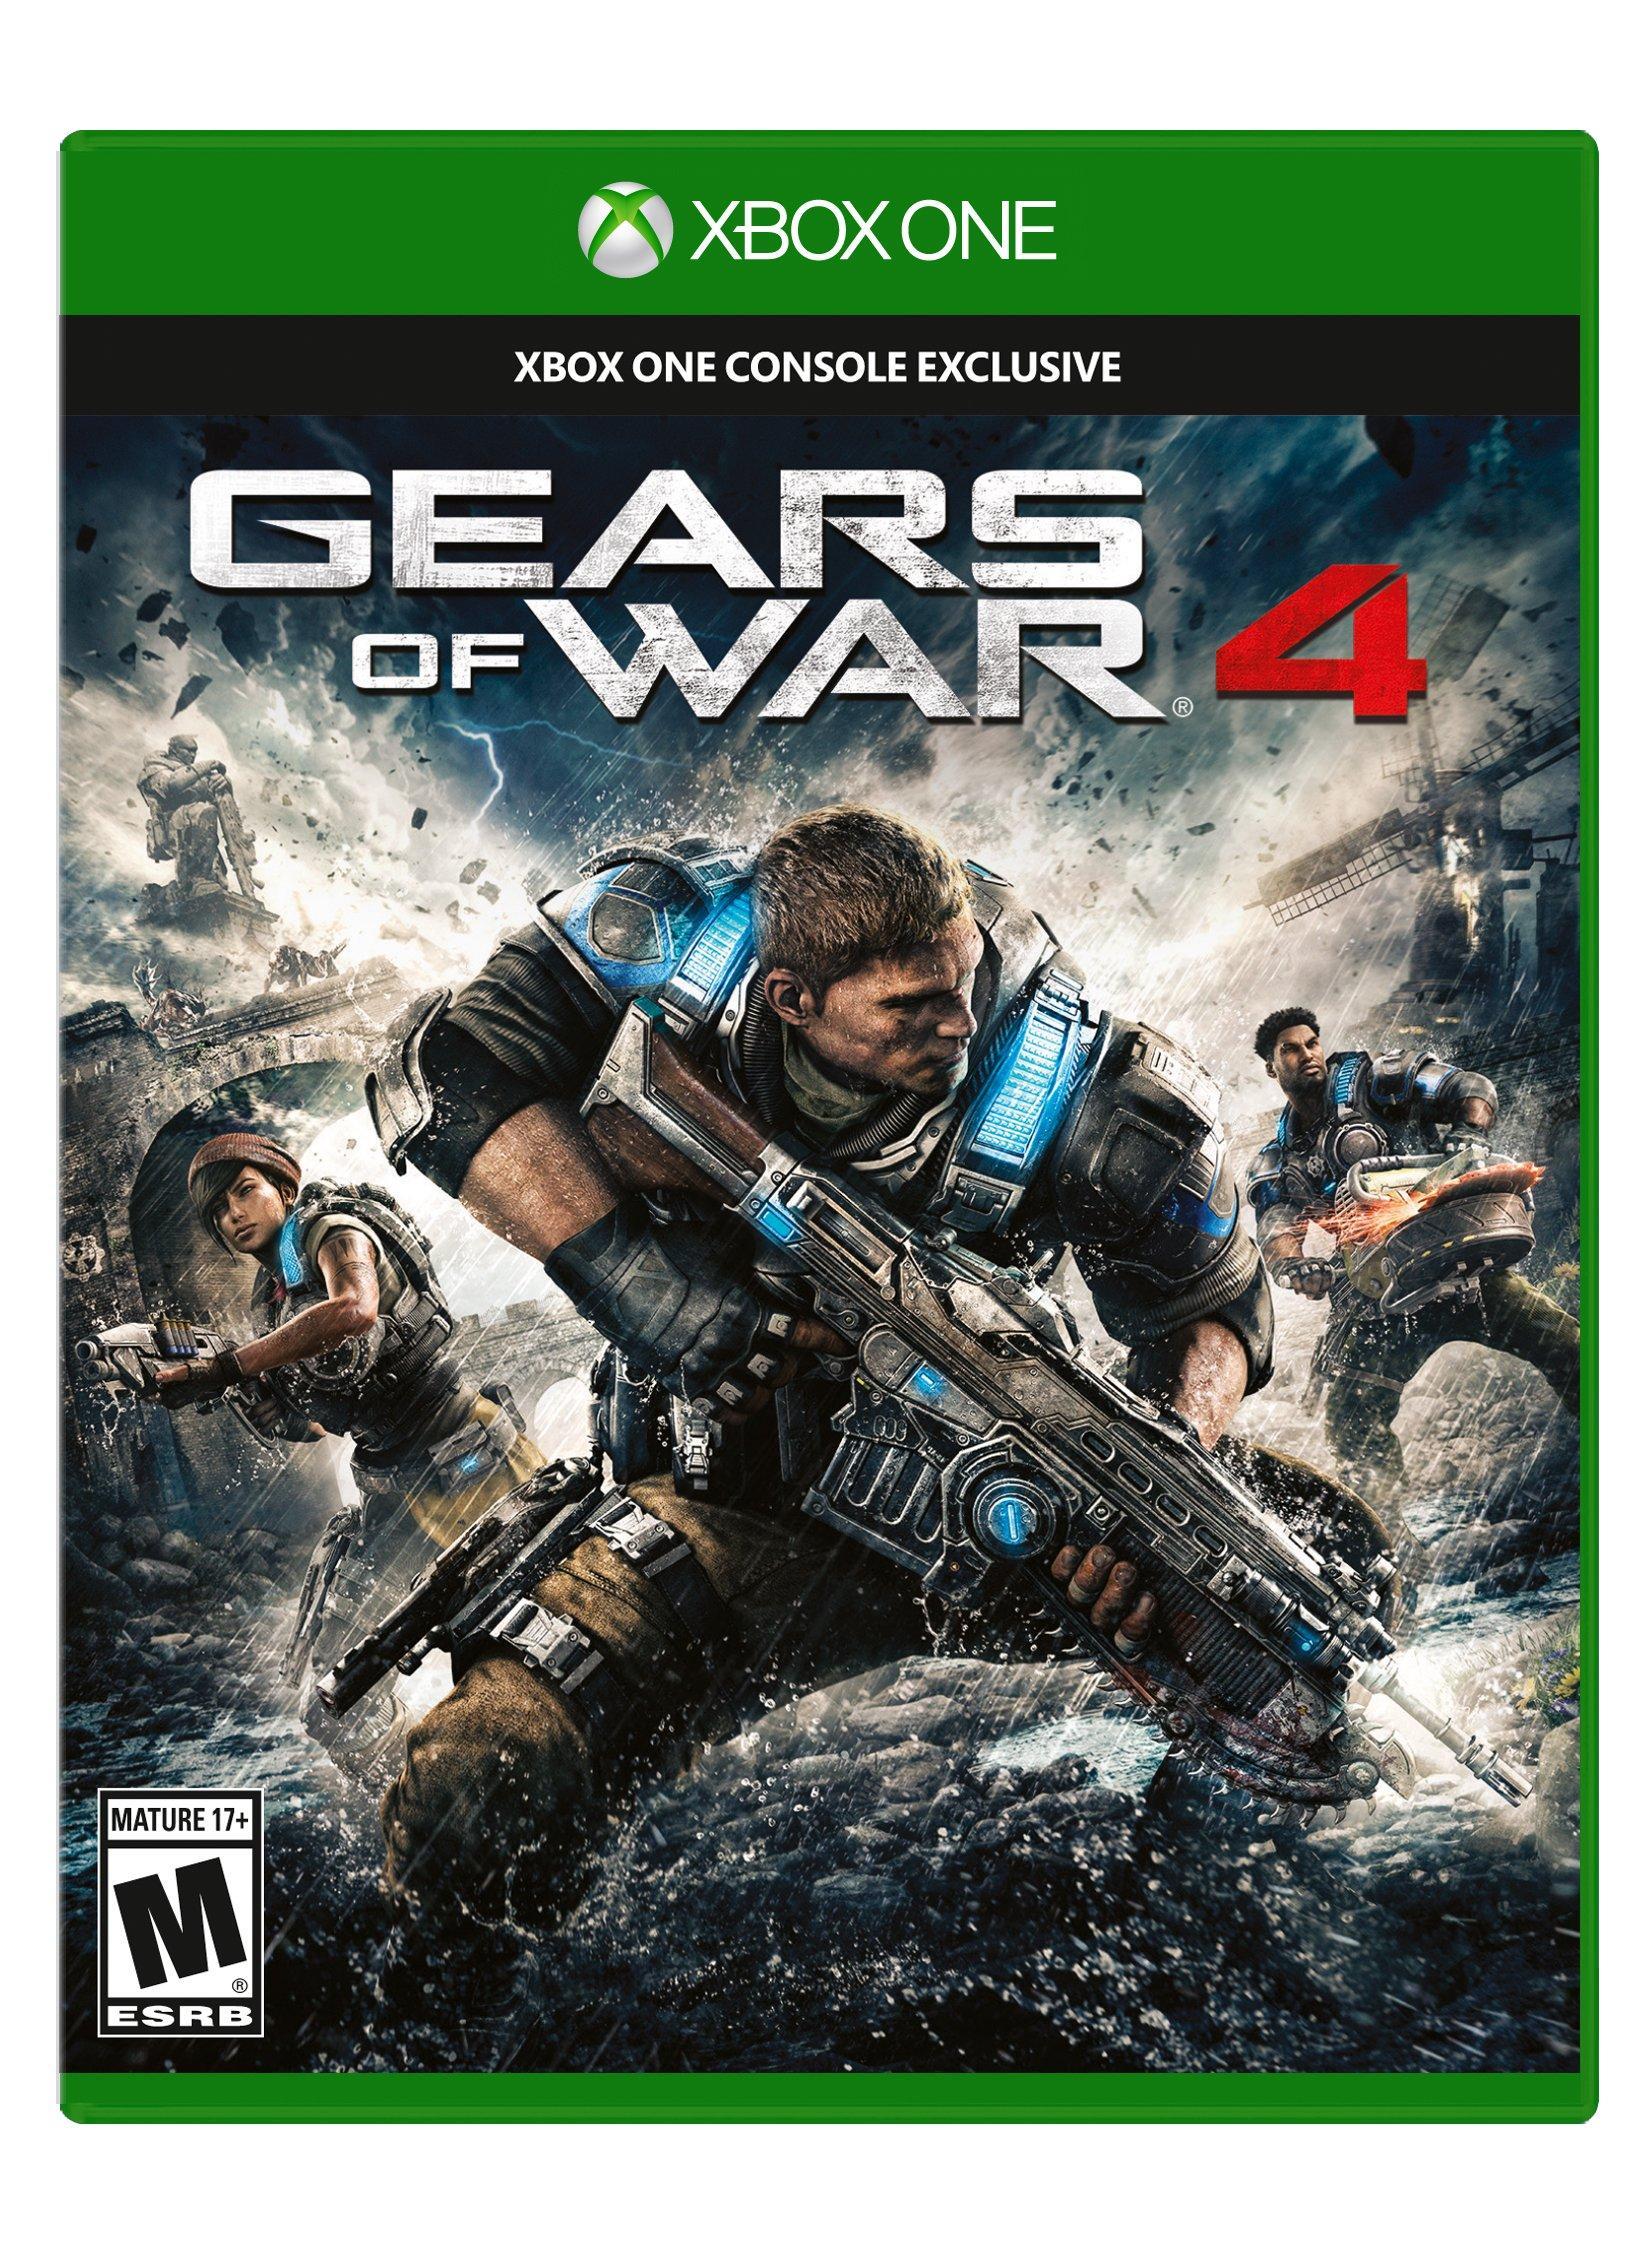 Gears of War 4 (pre-owned) $4